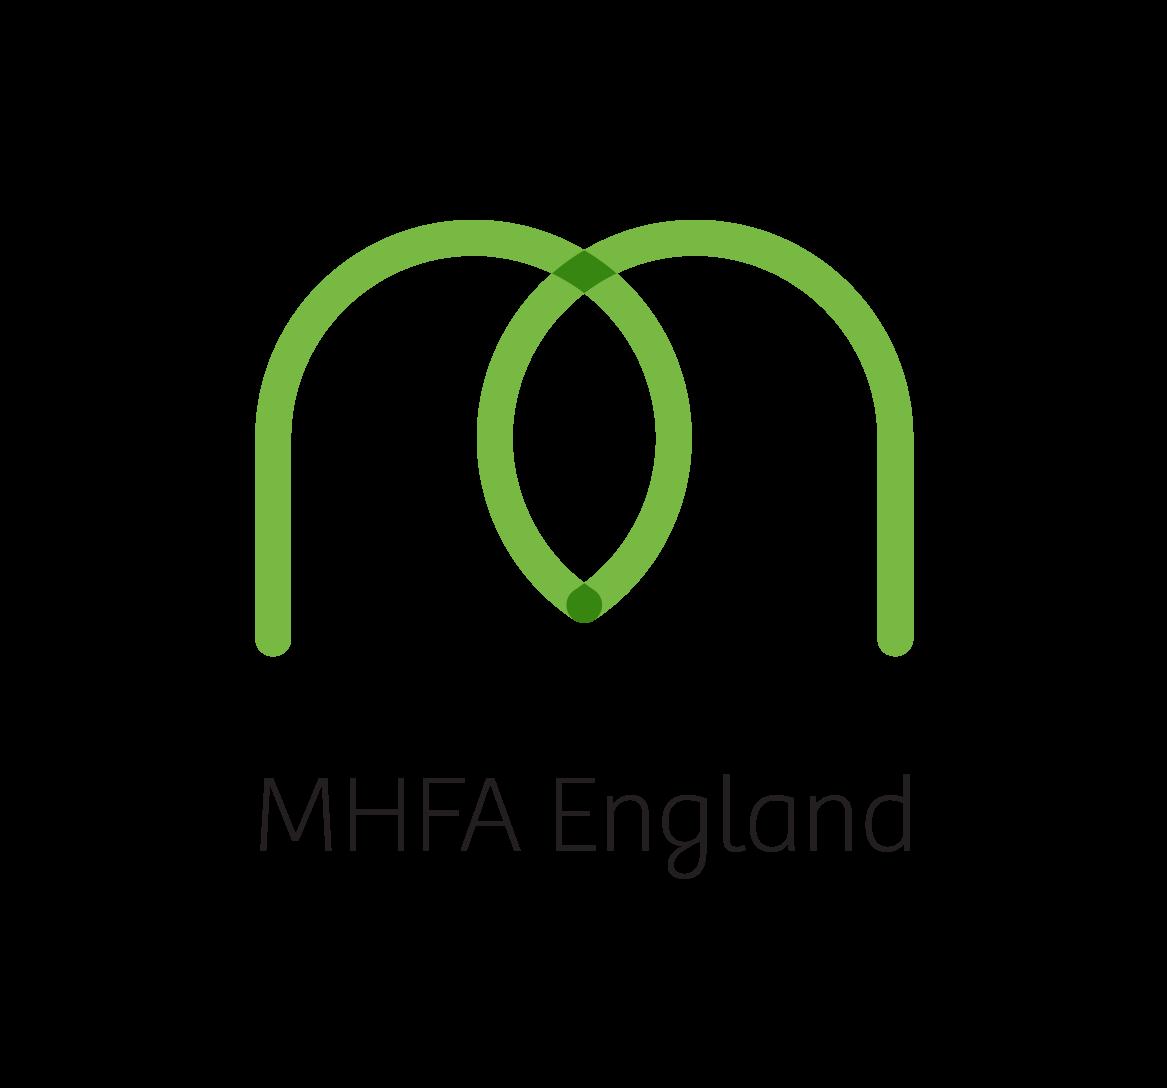 MHFA - Mental Health England First Aid